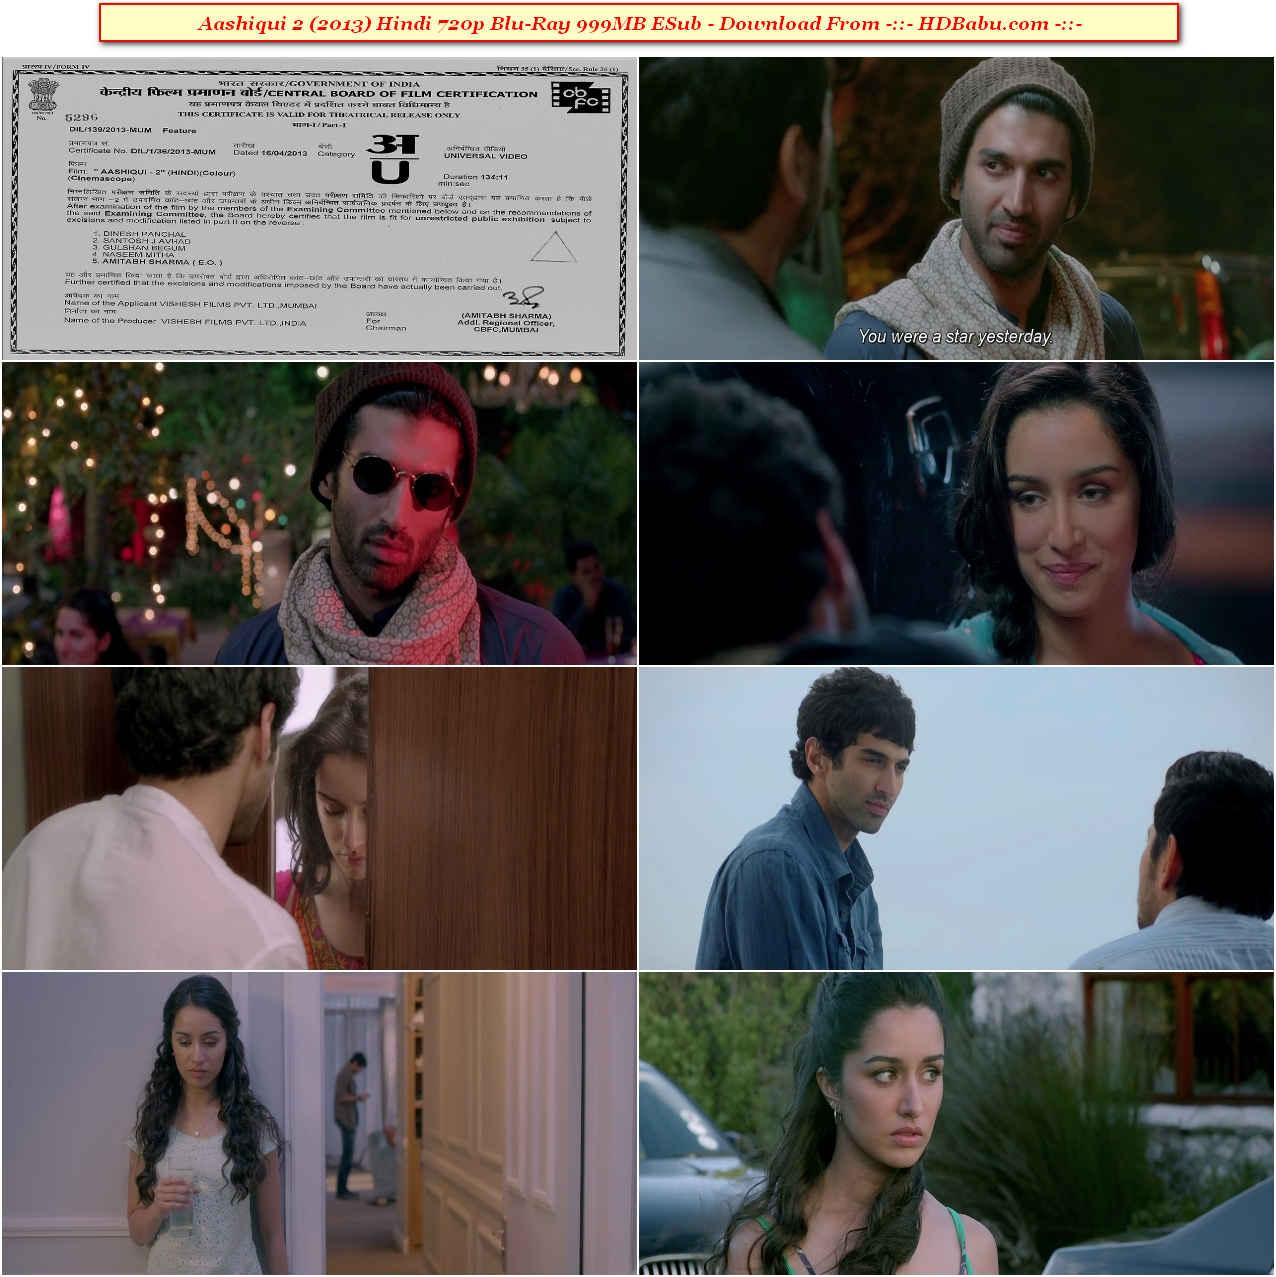 Aashiqui 2 Full Movie Download